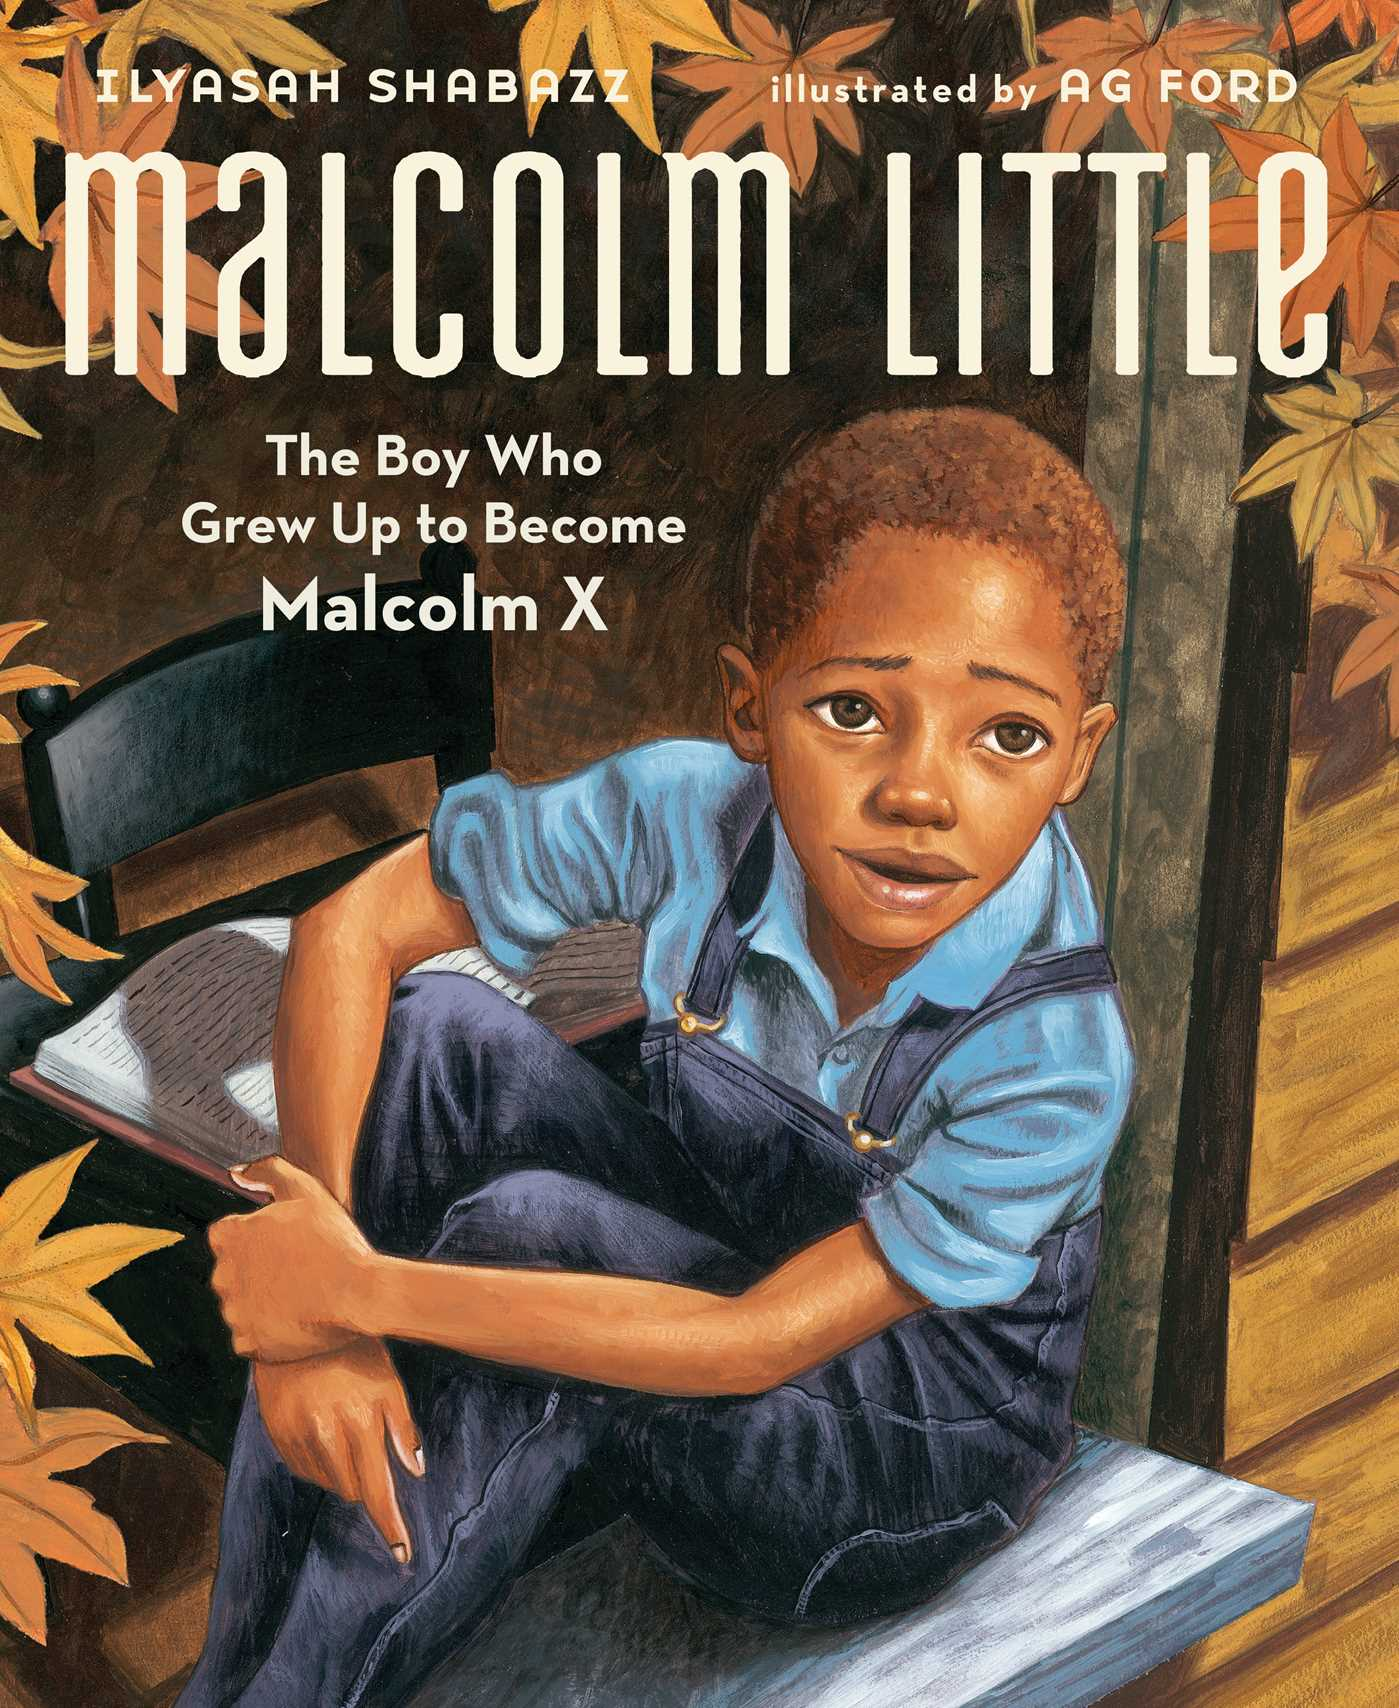 malcolm-little-9781442412163_hr.jpg